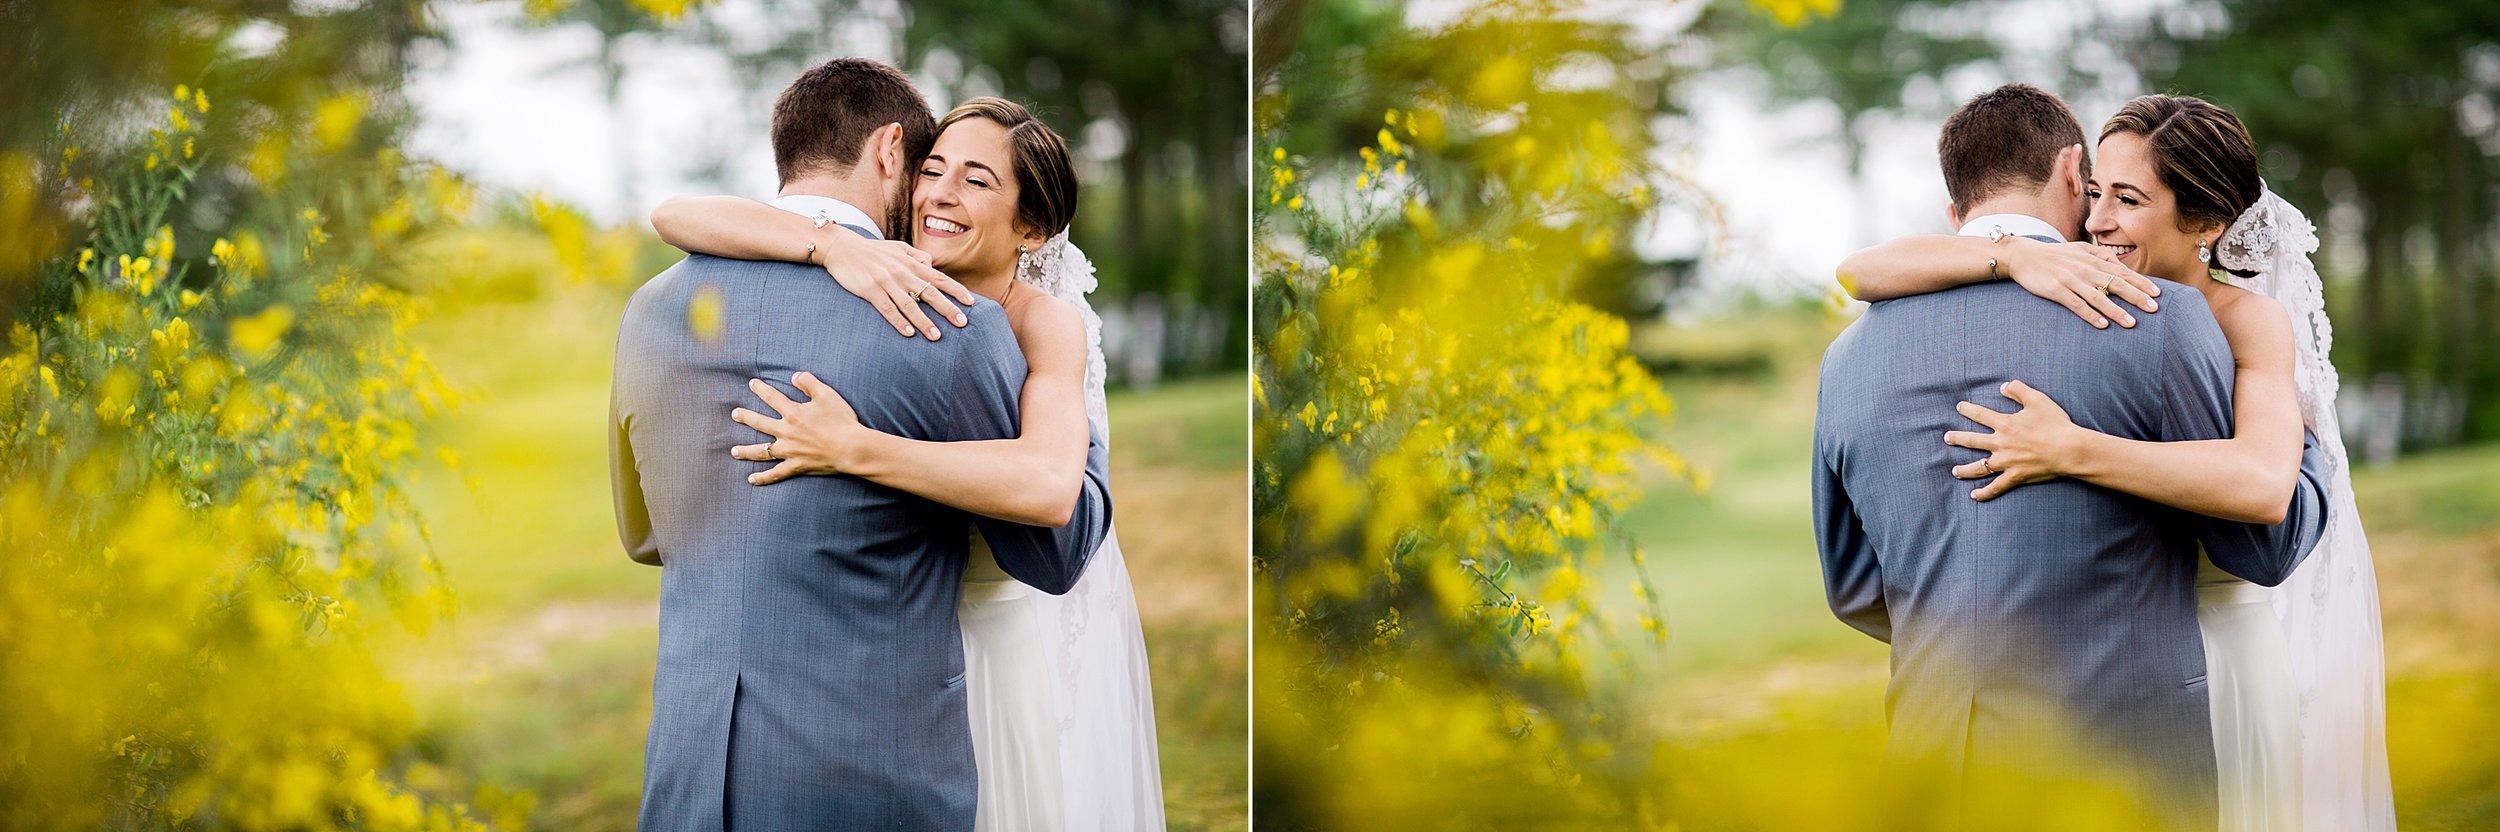 023 los angeles wedding photographer todd danforth photography cape cod.jpg